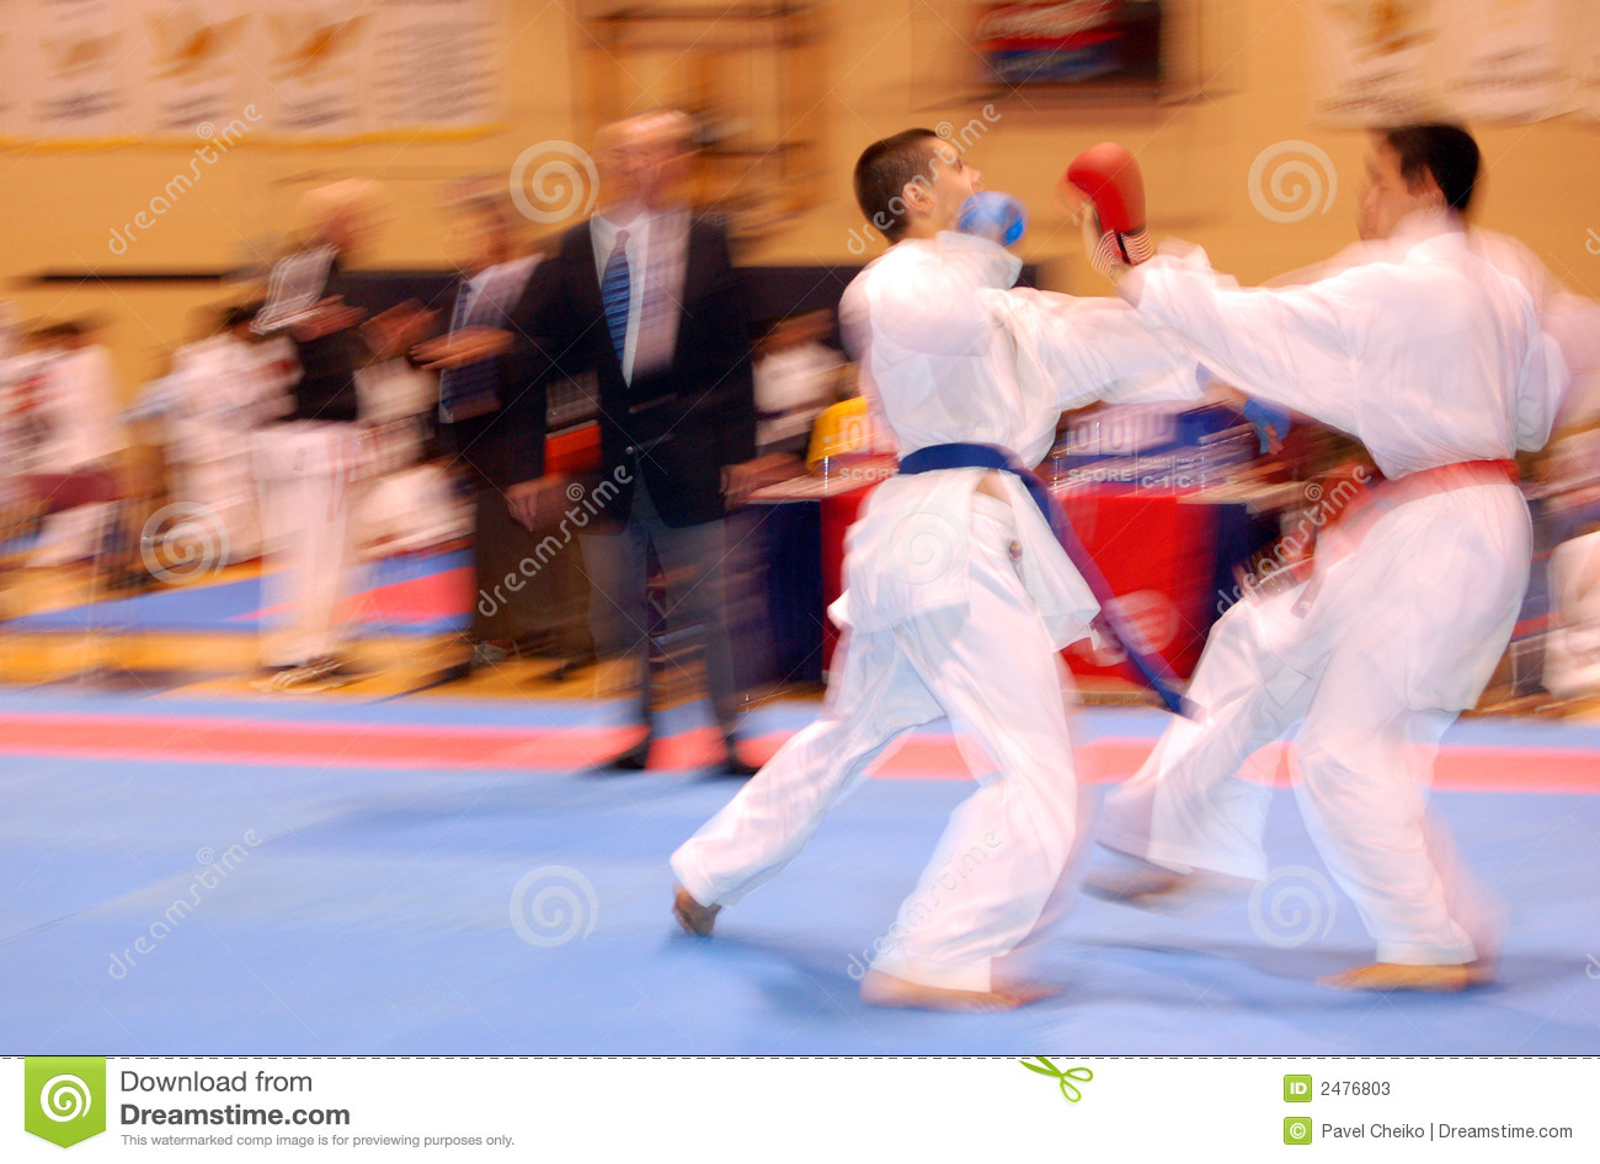 Karate αγώνα επίθεσης